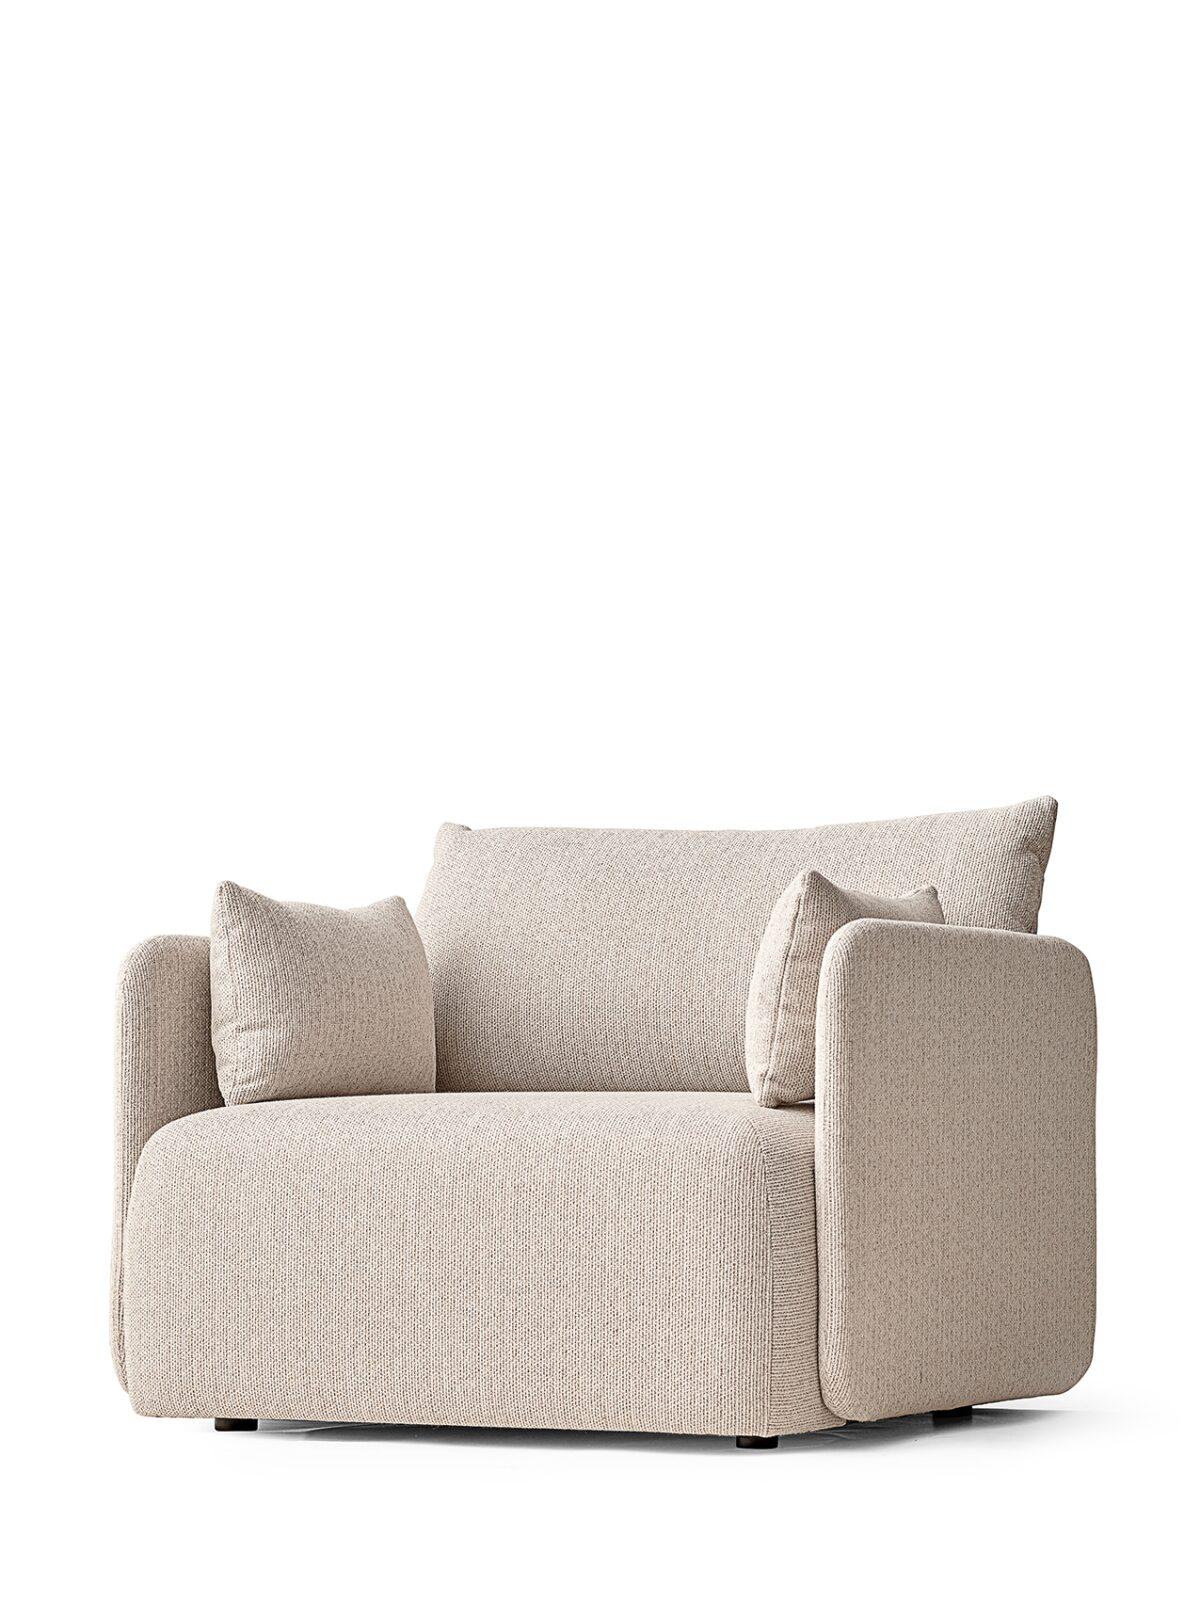 9849029 Offset Sofa 1 Seater Savannah 202 angle2019 06 25 13 54 27 884